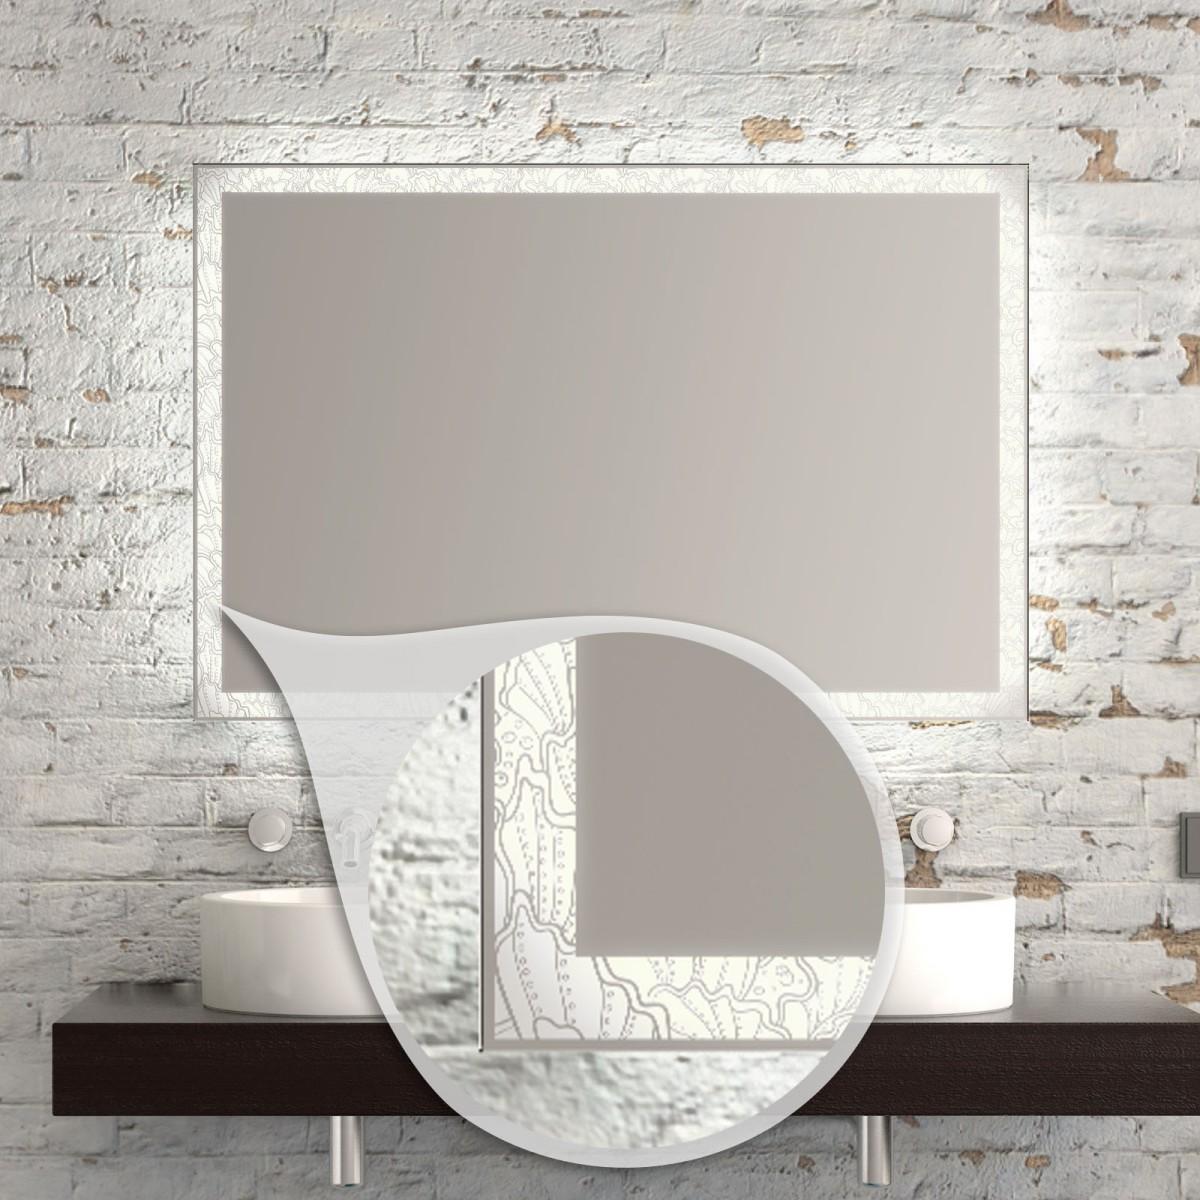 Badspiegel LED Warburg